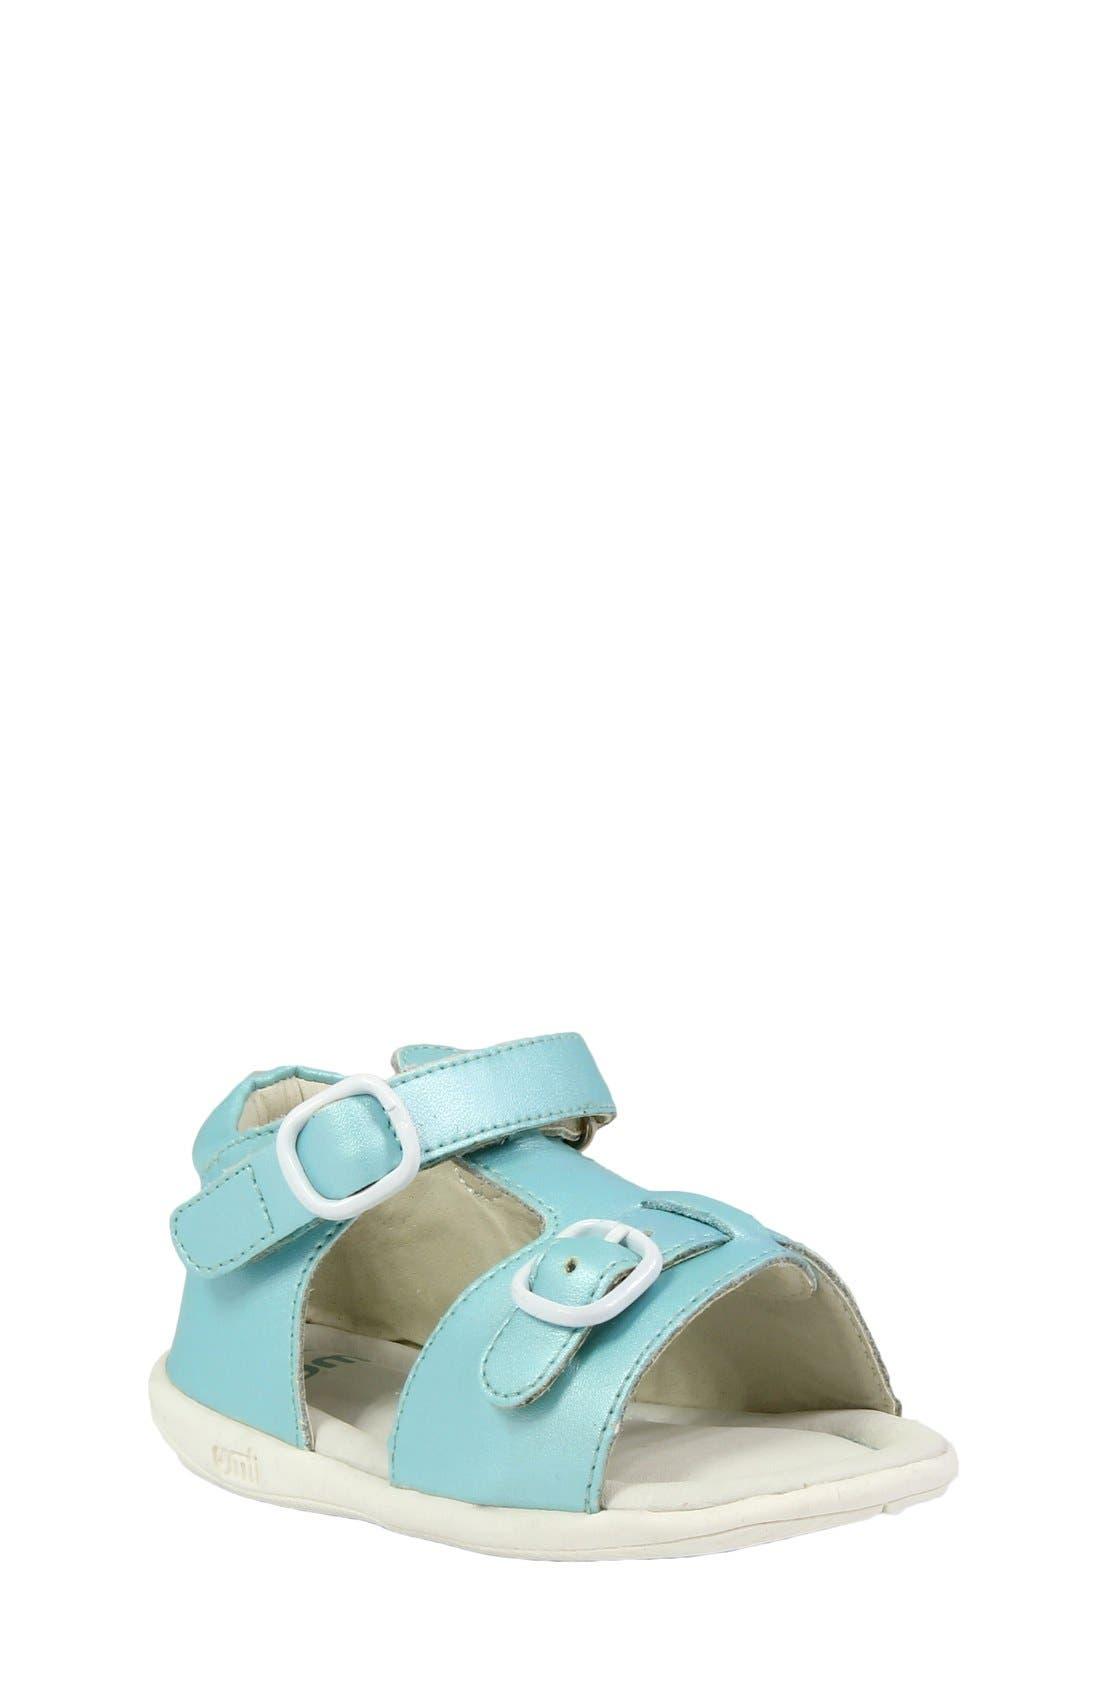 Alternate Image 1 Selected - Umi 'Noel' Sandal (Baby, Walker & Toddler)